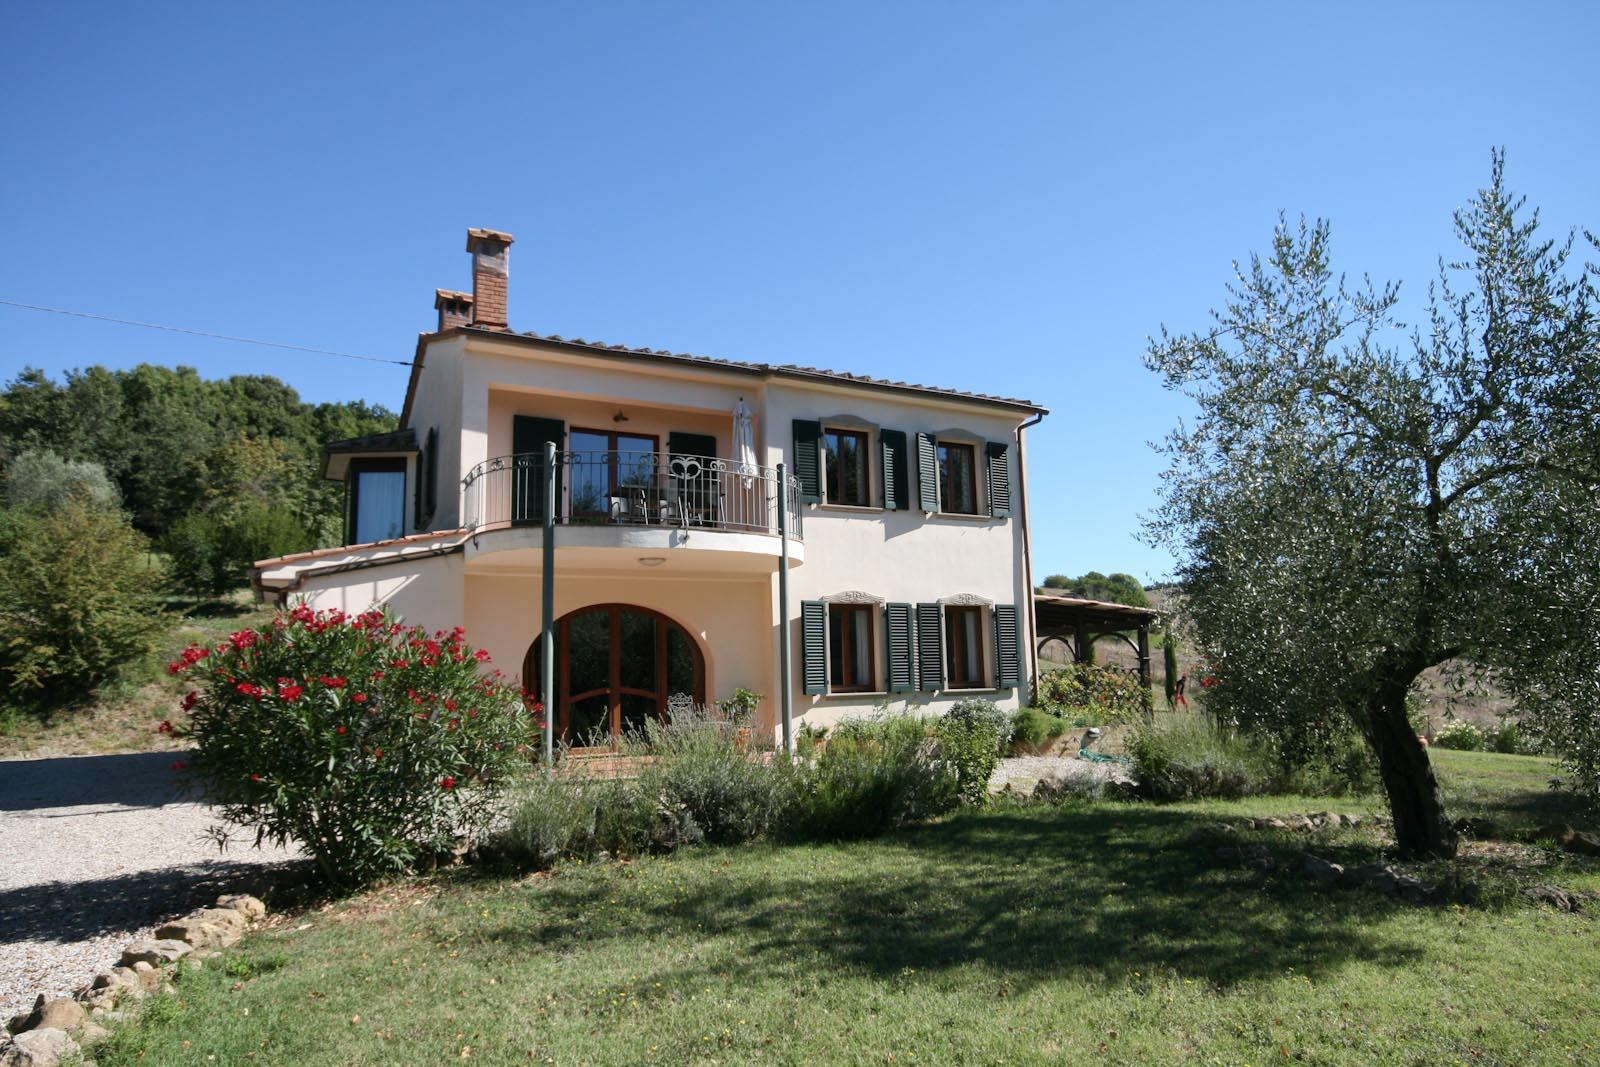 Villa in vendita in italia toscana pisa volterra villa - Giardini case moderne ...